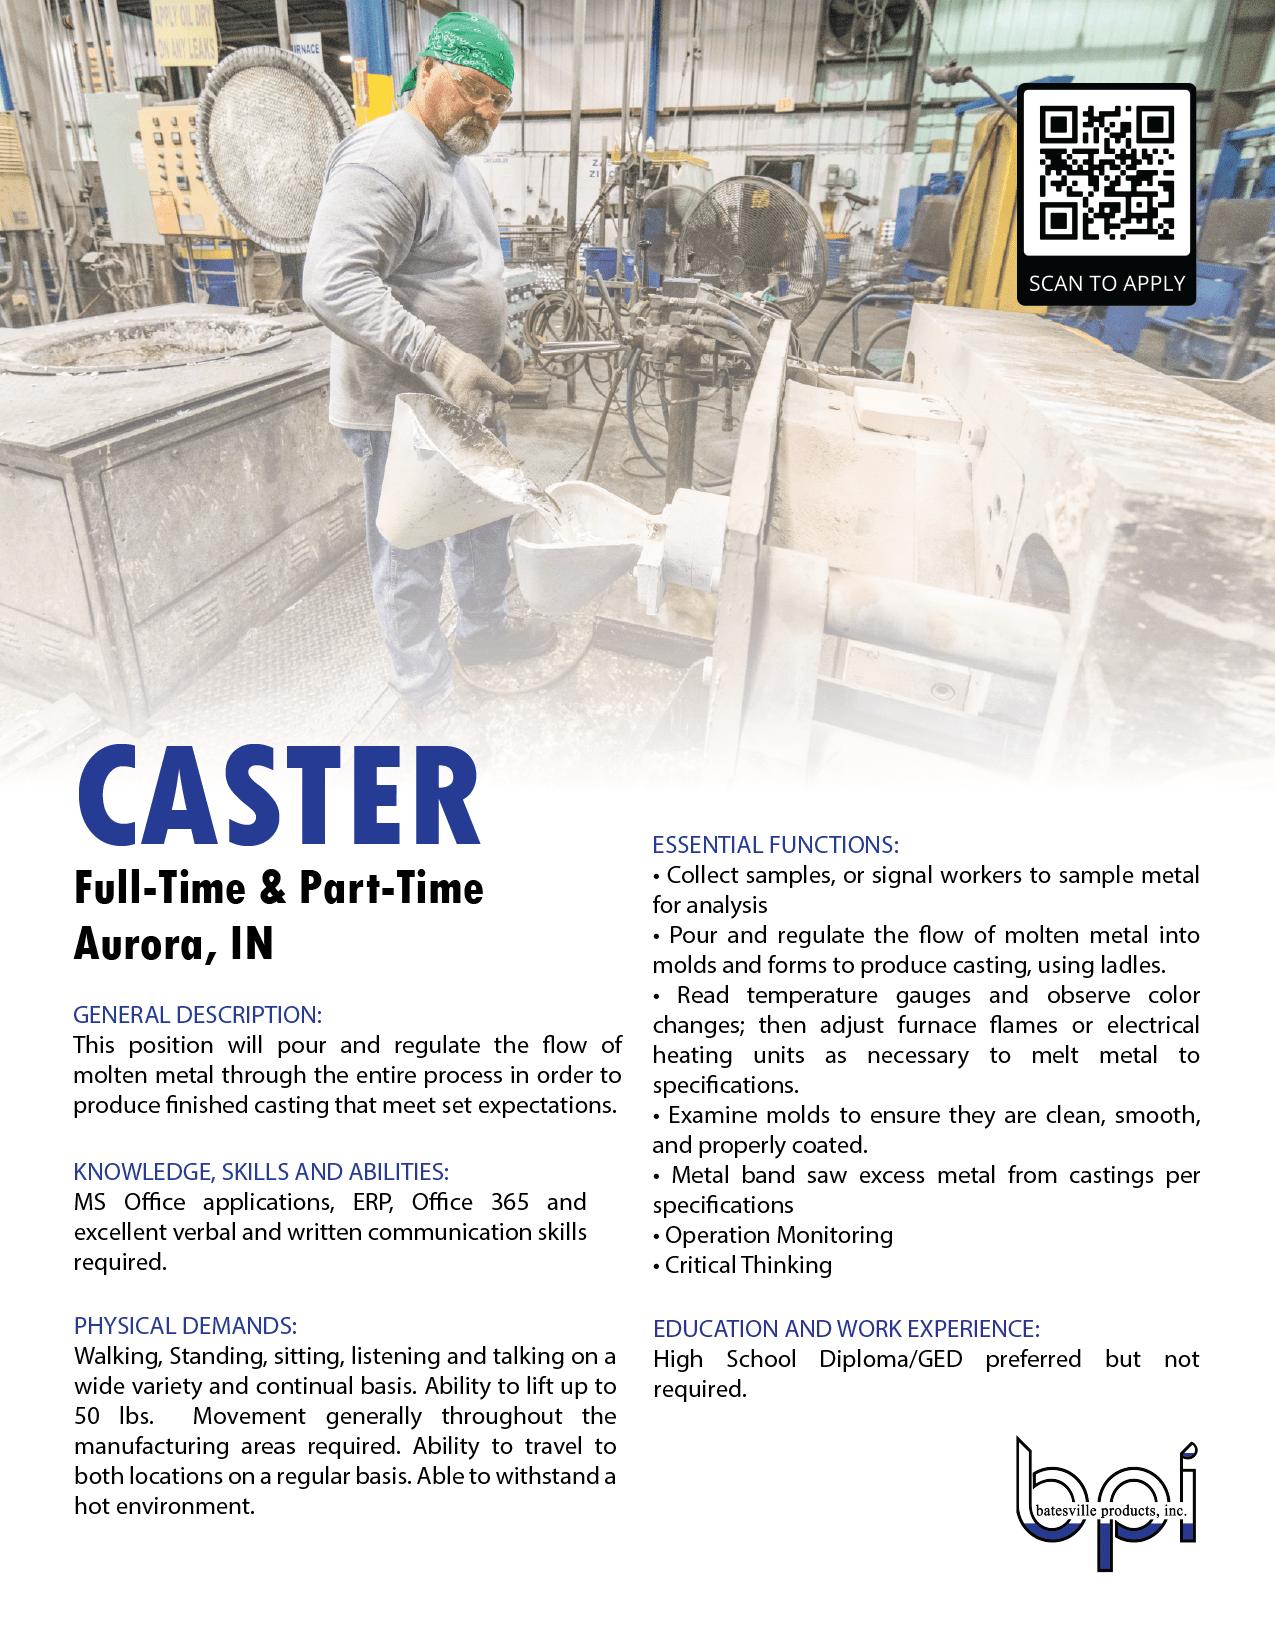 caster job description